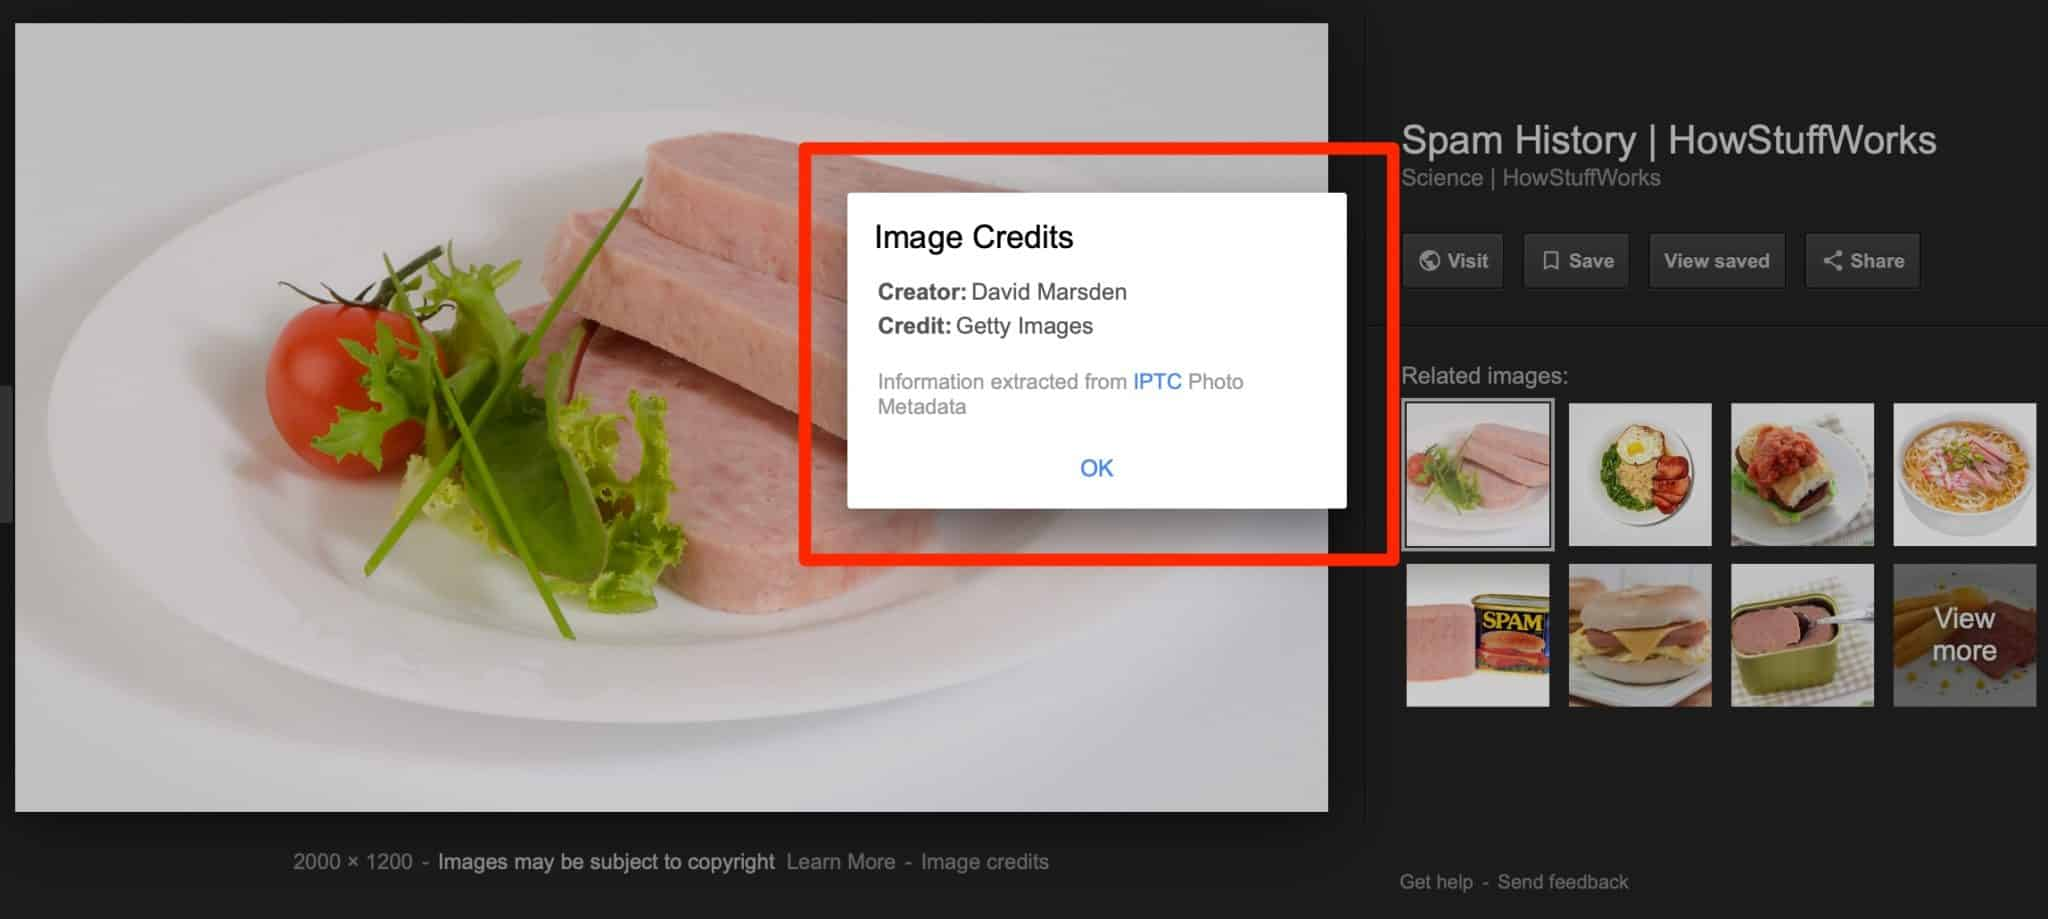 Google Image Search Image 2